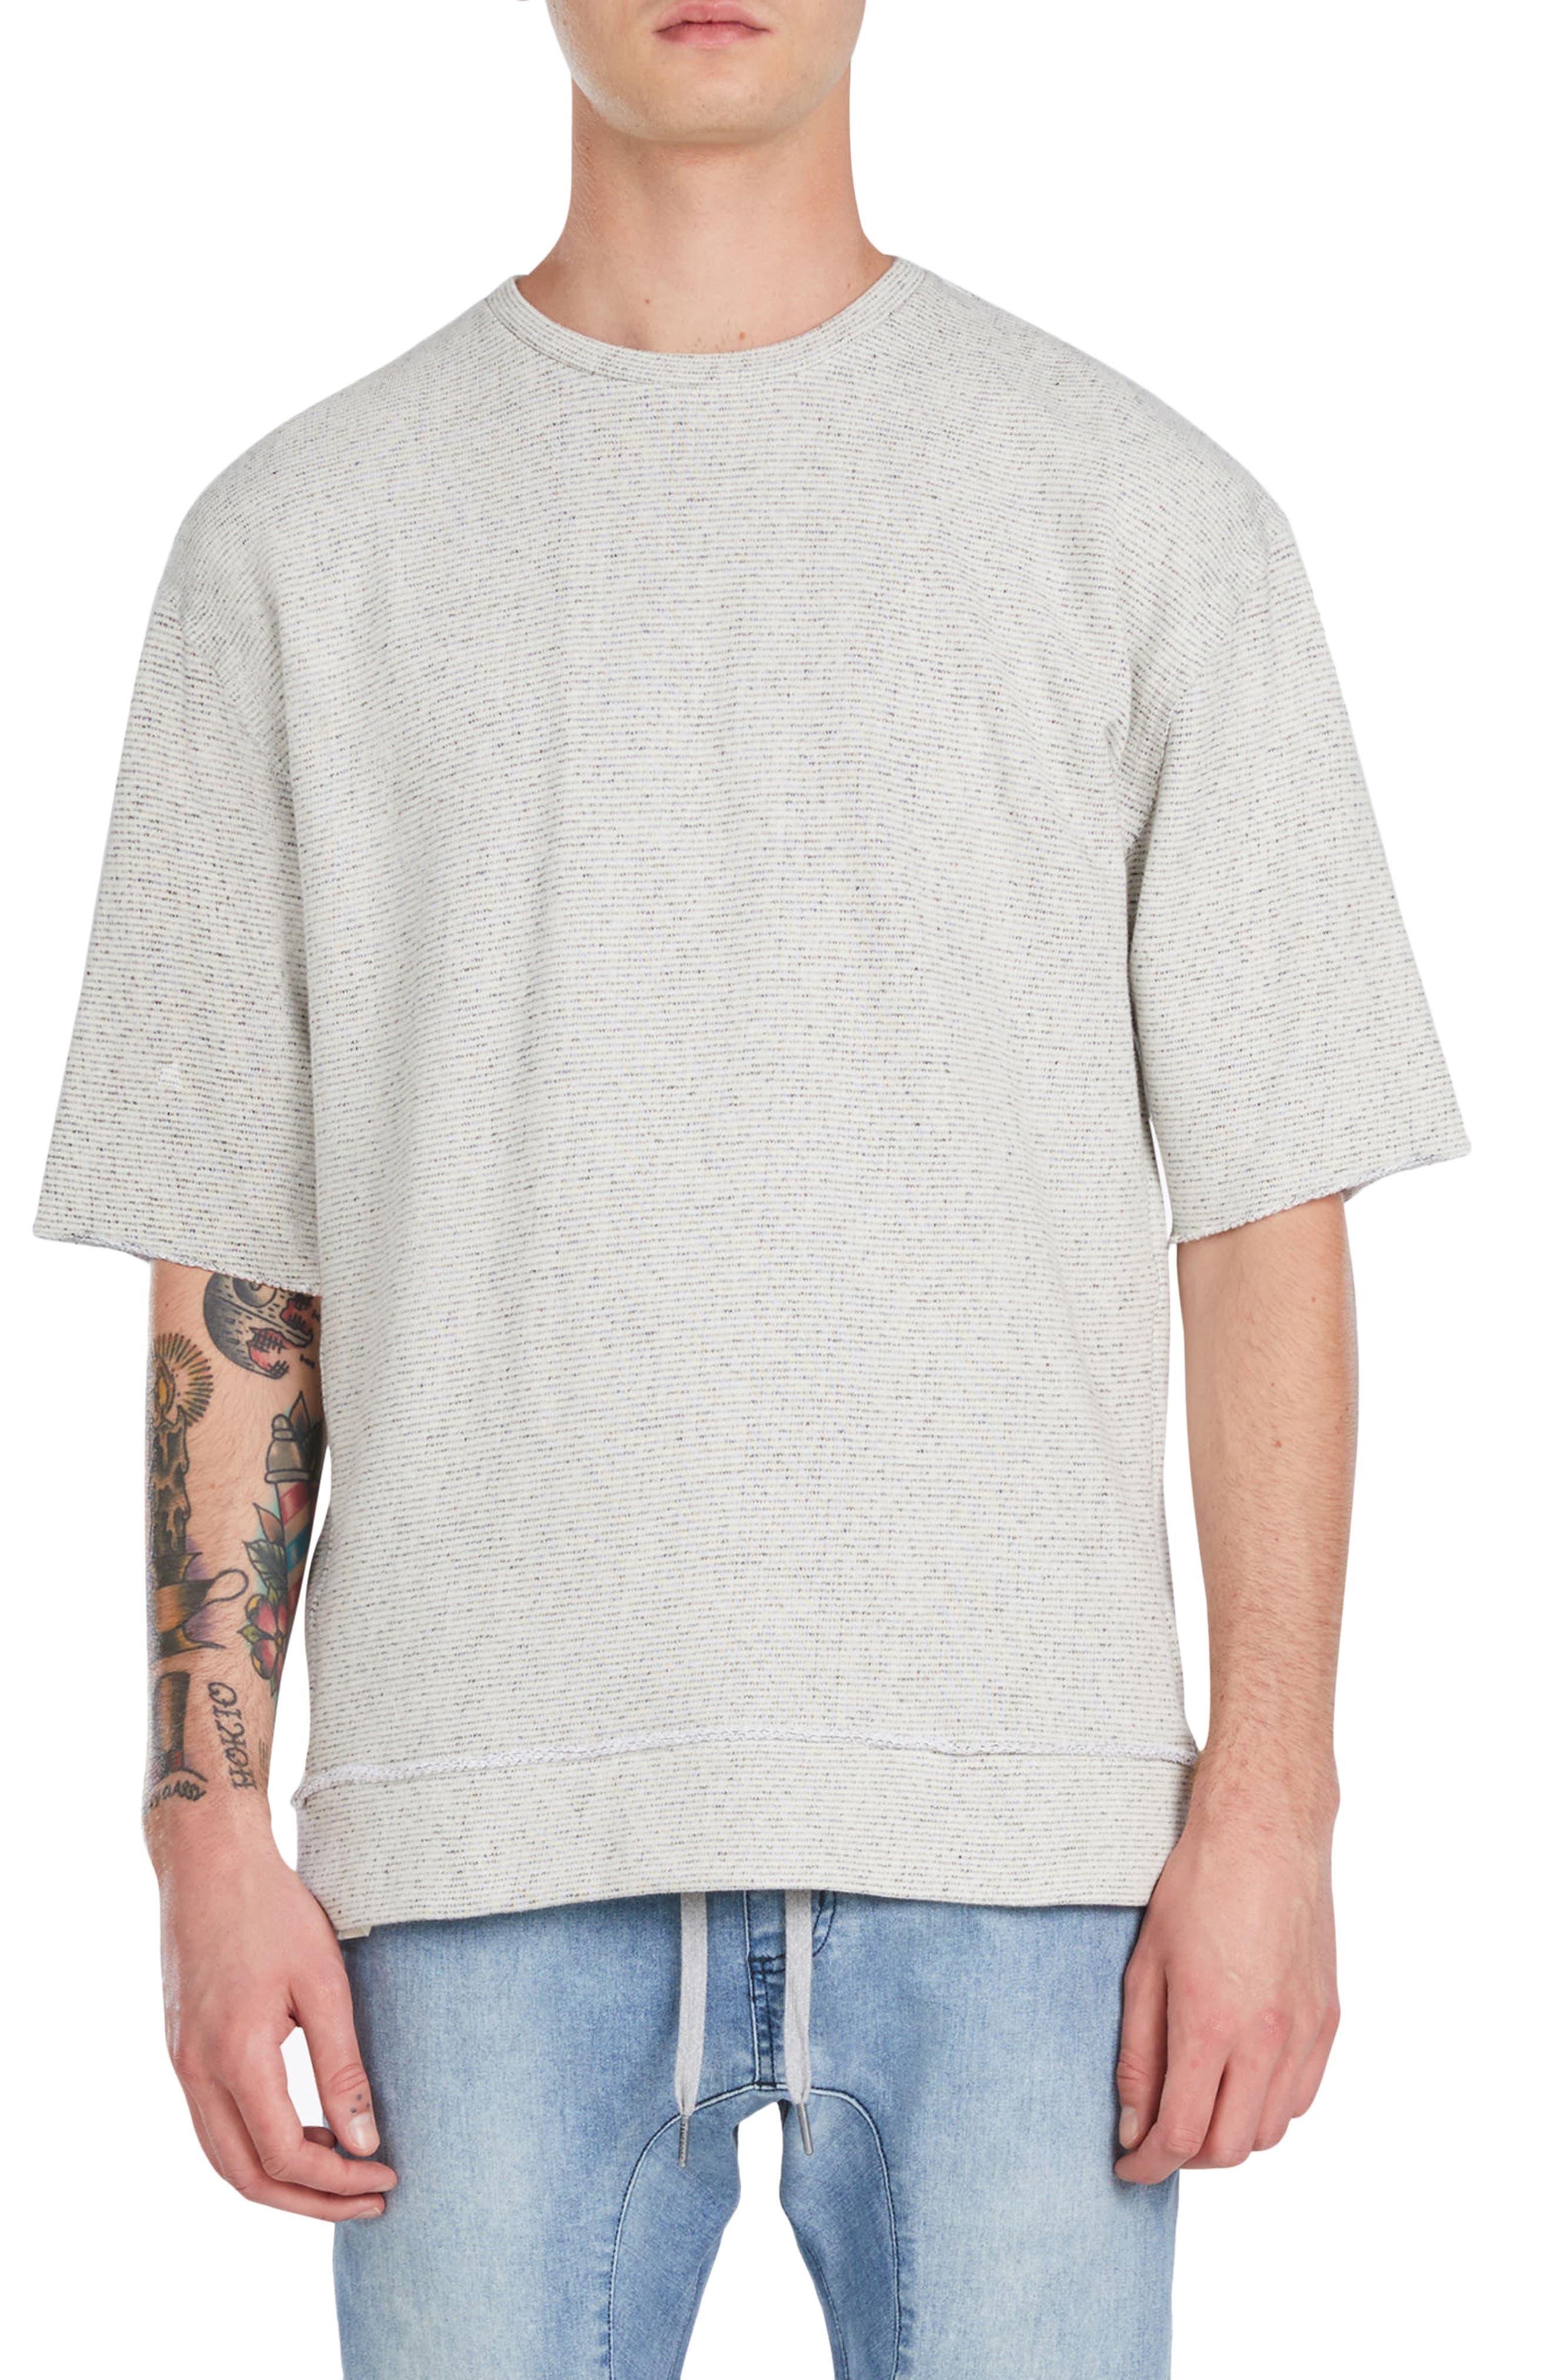 Main Image - ZANEROBE Rugger Oversize Half Sleeve Sweatshirt